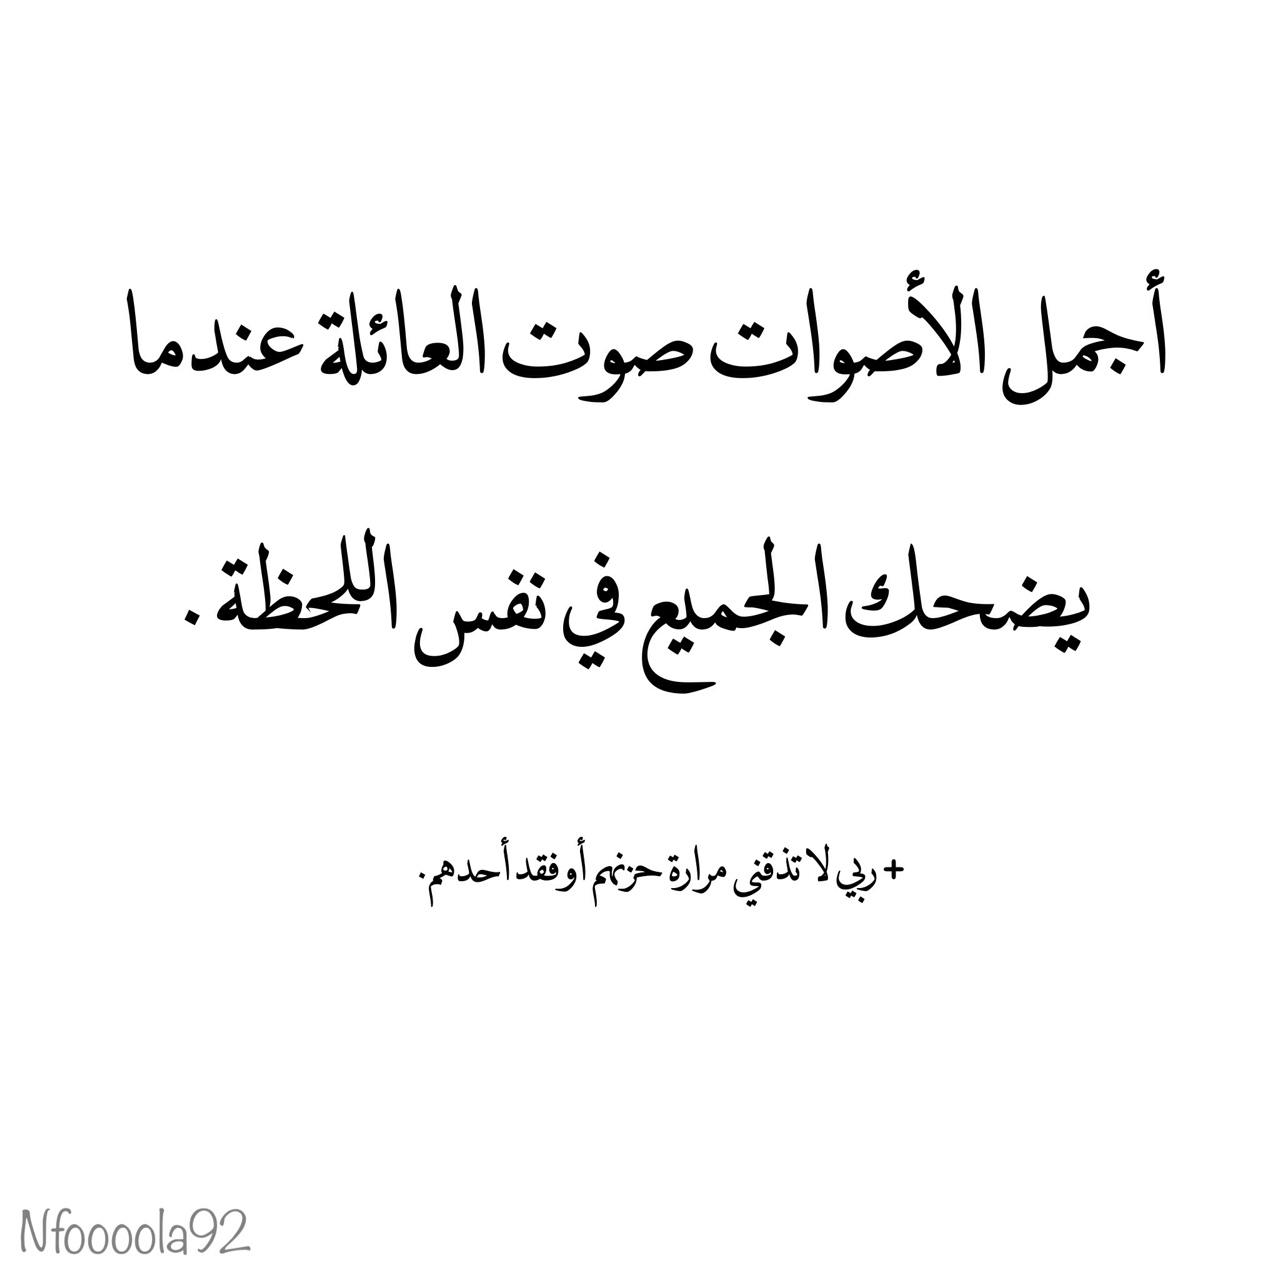 Downloading Arabic Quotes: ربي لا تحرمني من عائلتي 😍